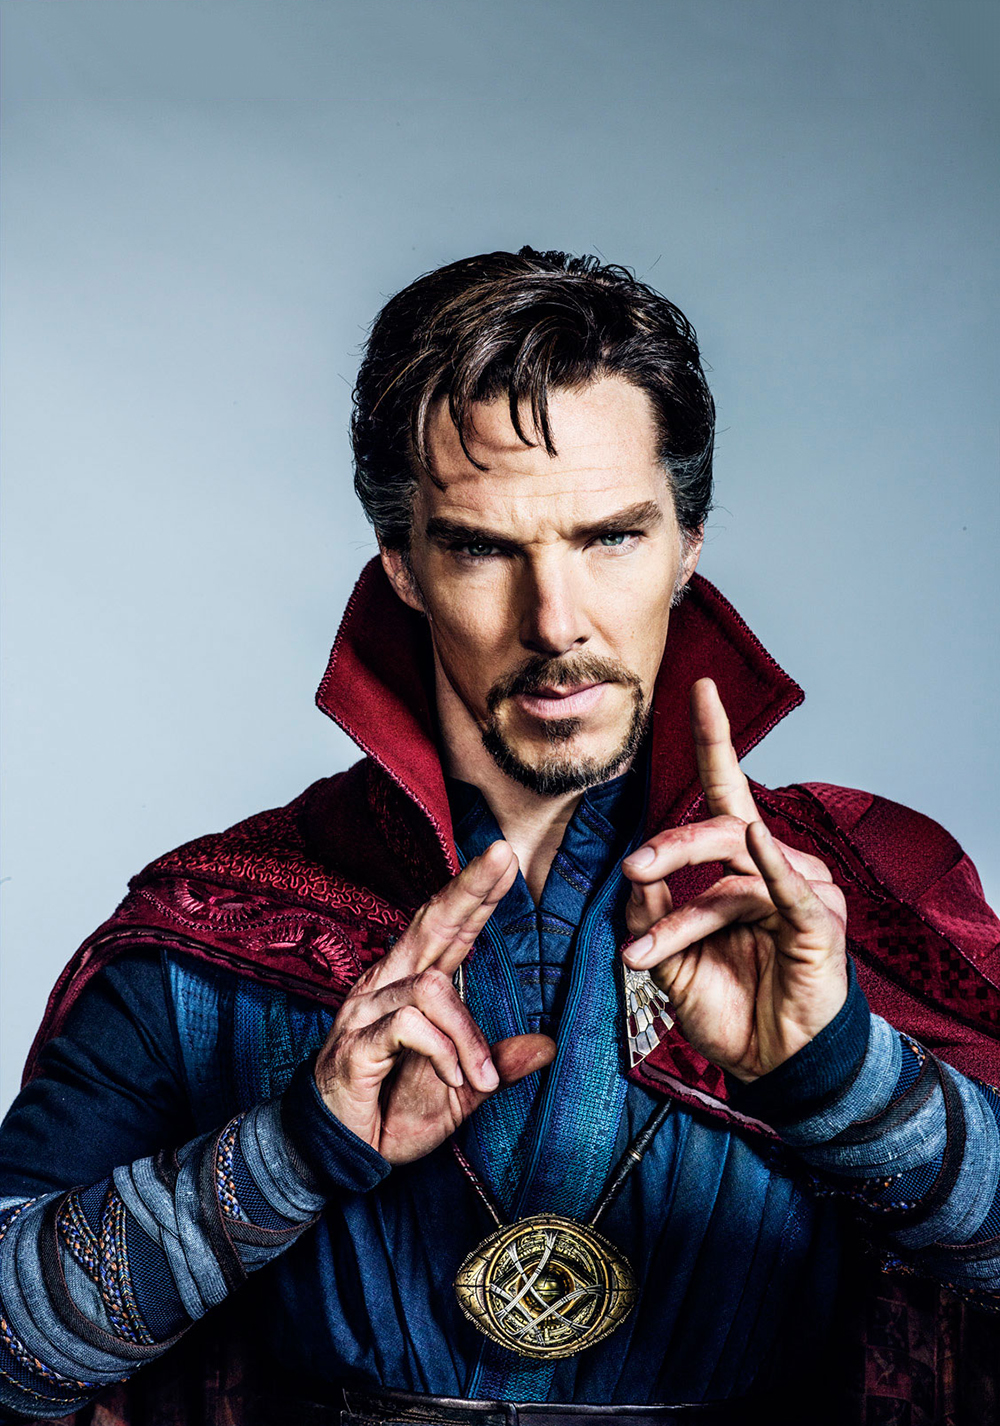 El Dr. Stephen Strange (Benedict Cumberbatch) en Doctor Strange (2016). Imagen: fanart.tv